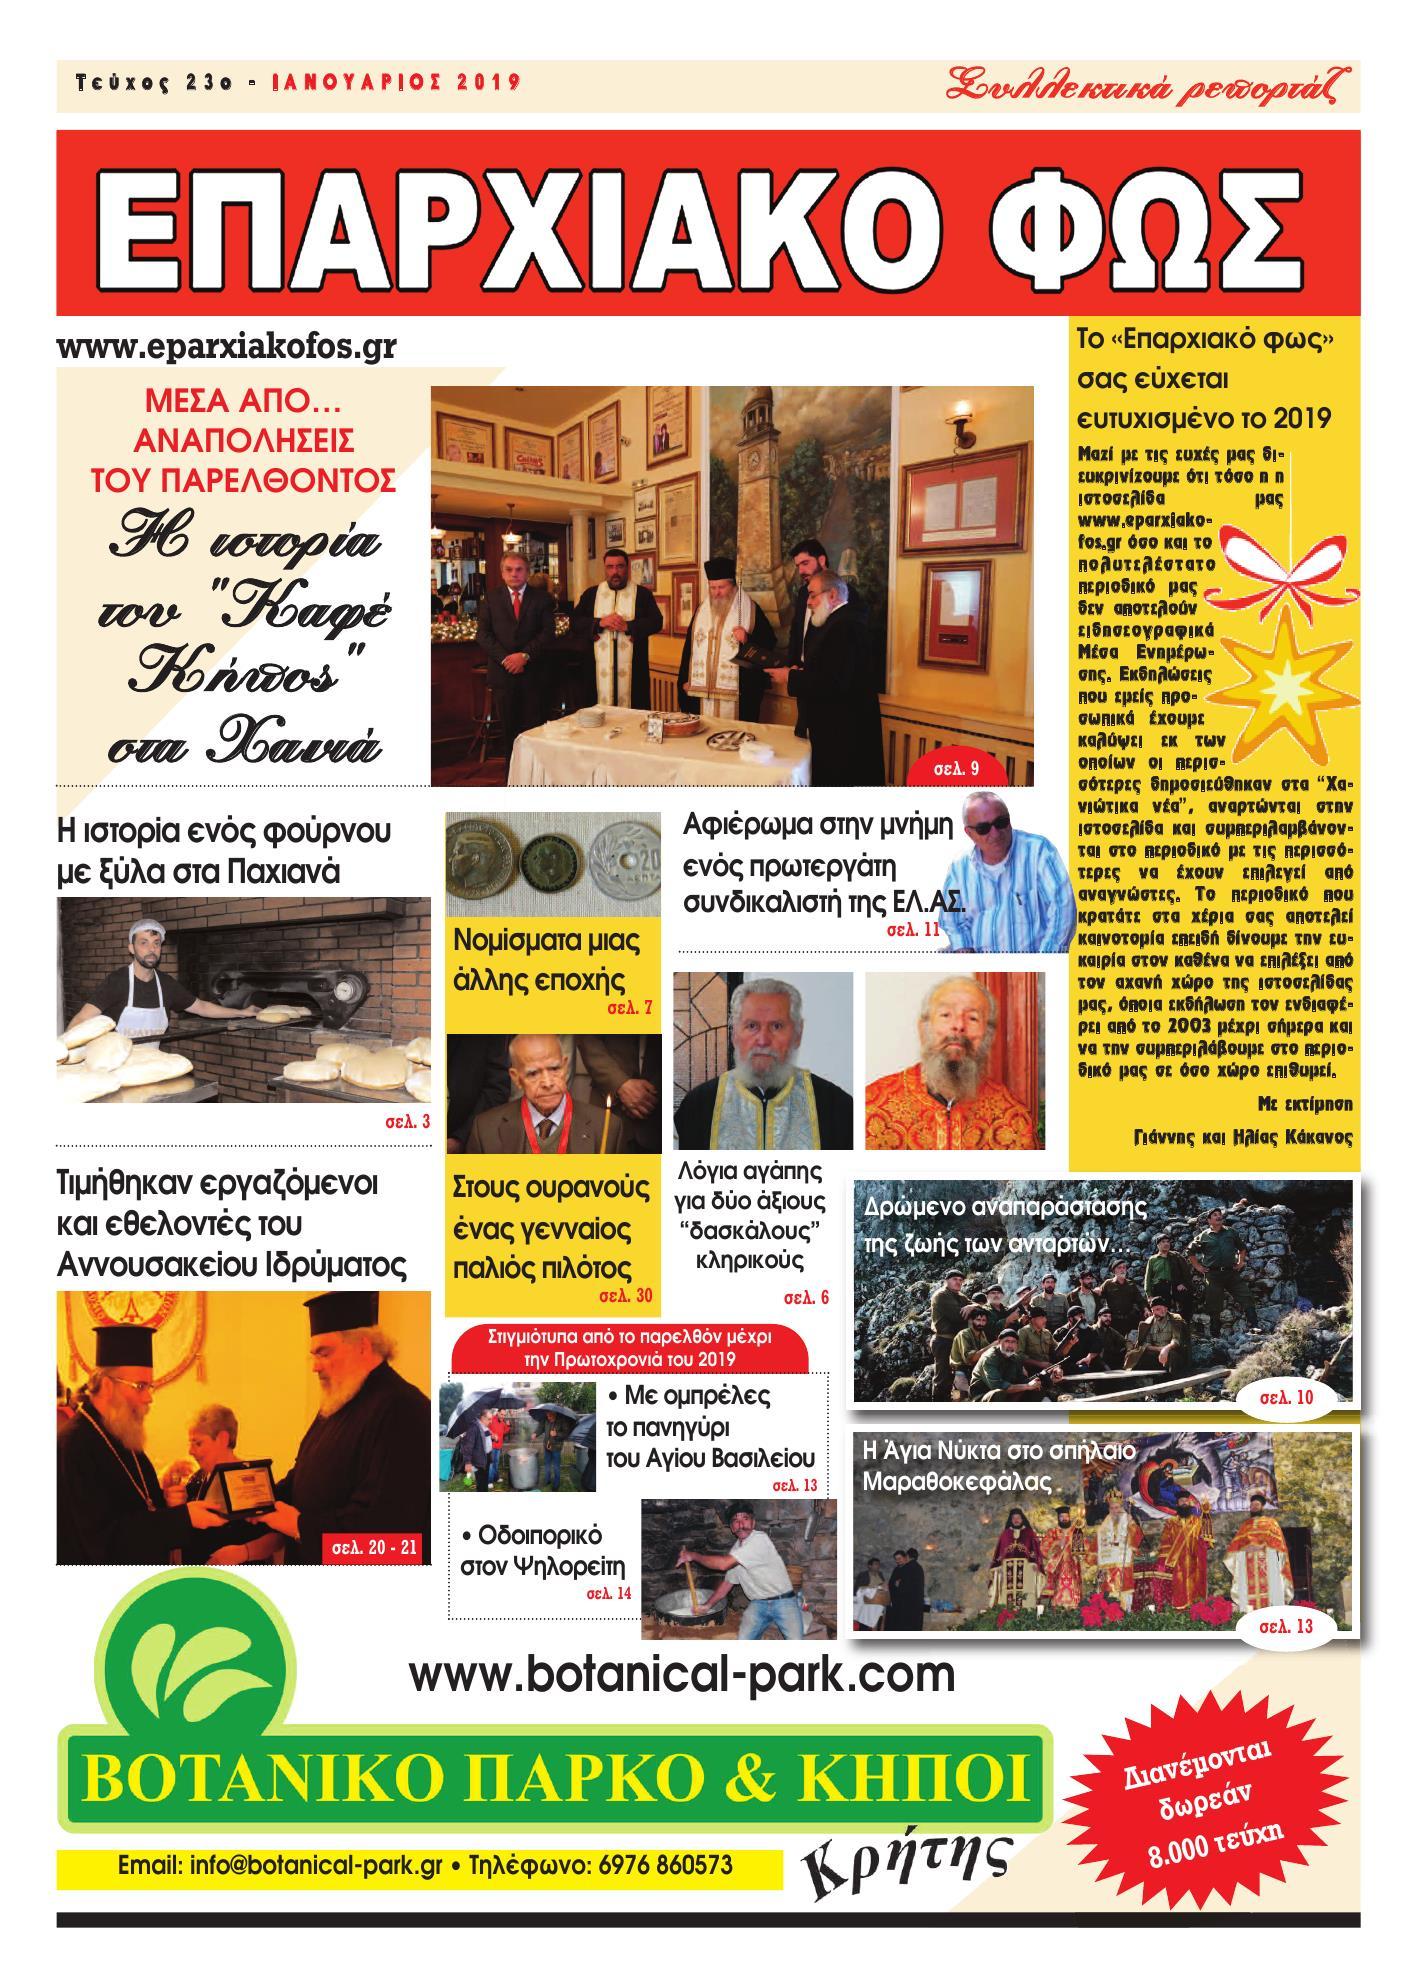 23 KAKANOULHS (Page 01)